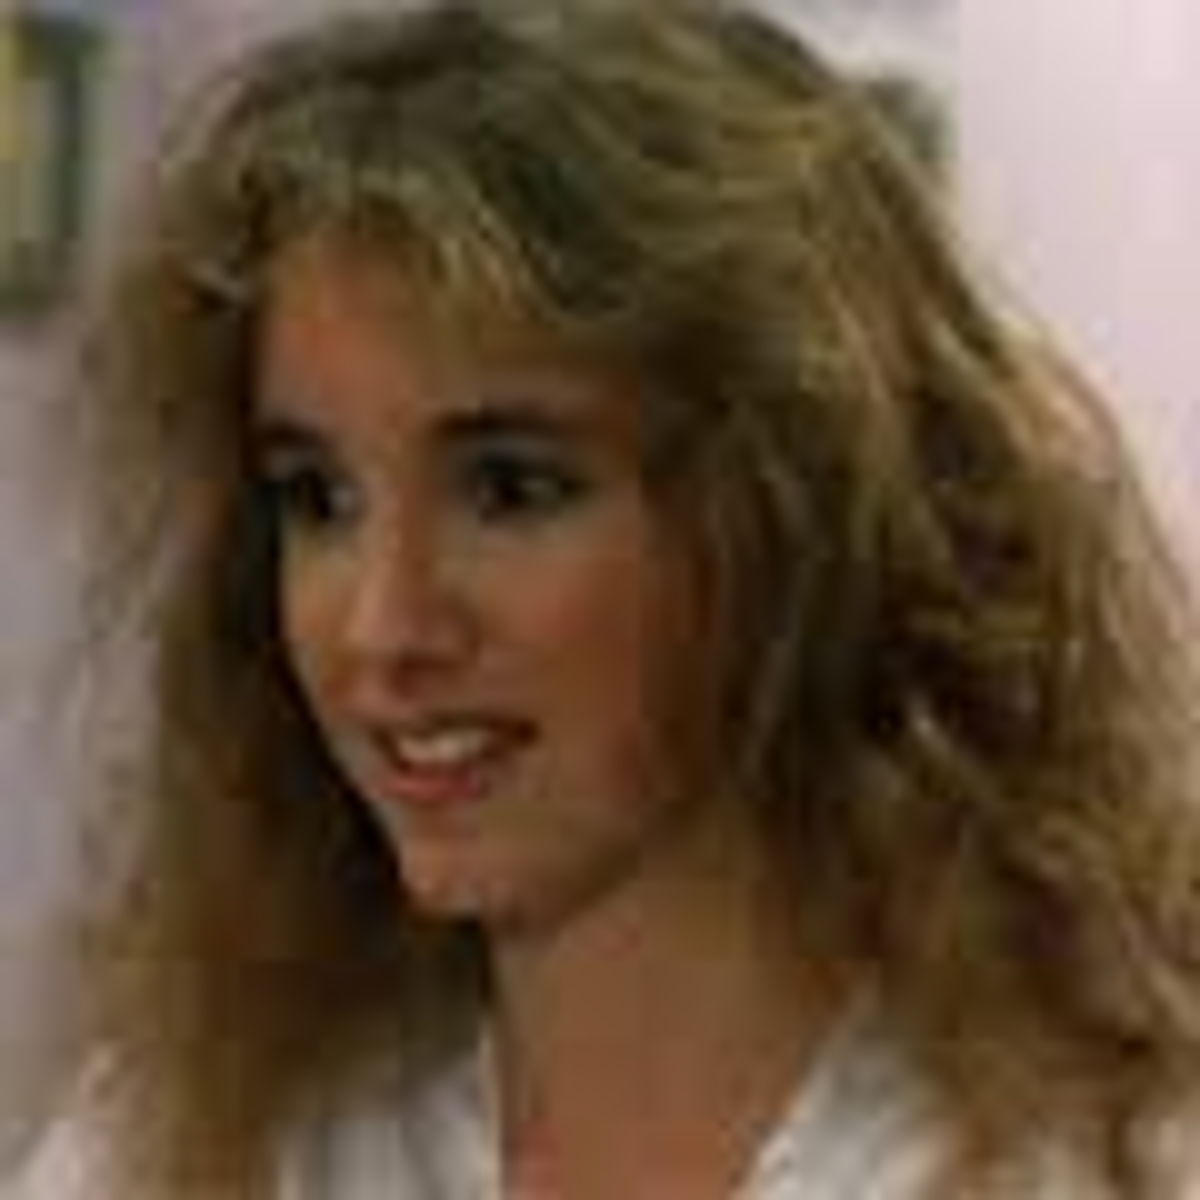 Barbara Howard played Santini's niece Holly in Airwolf